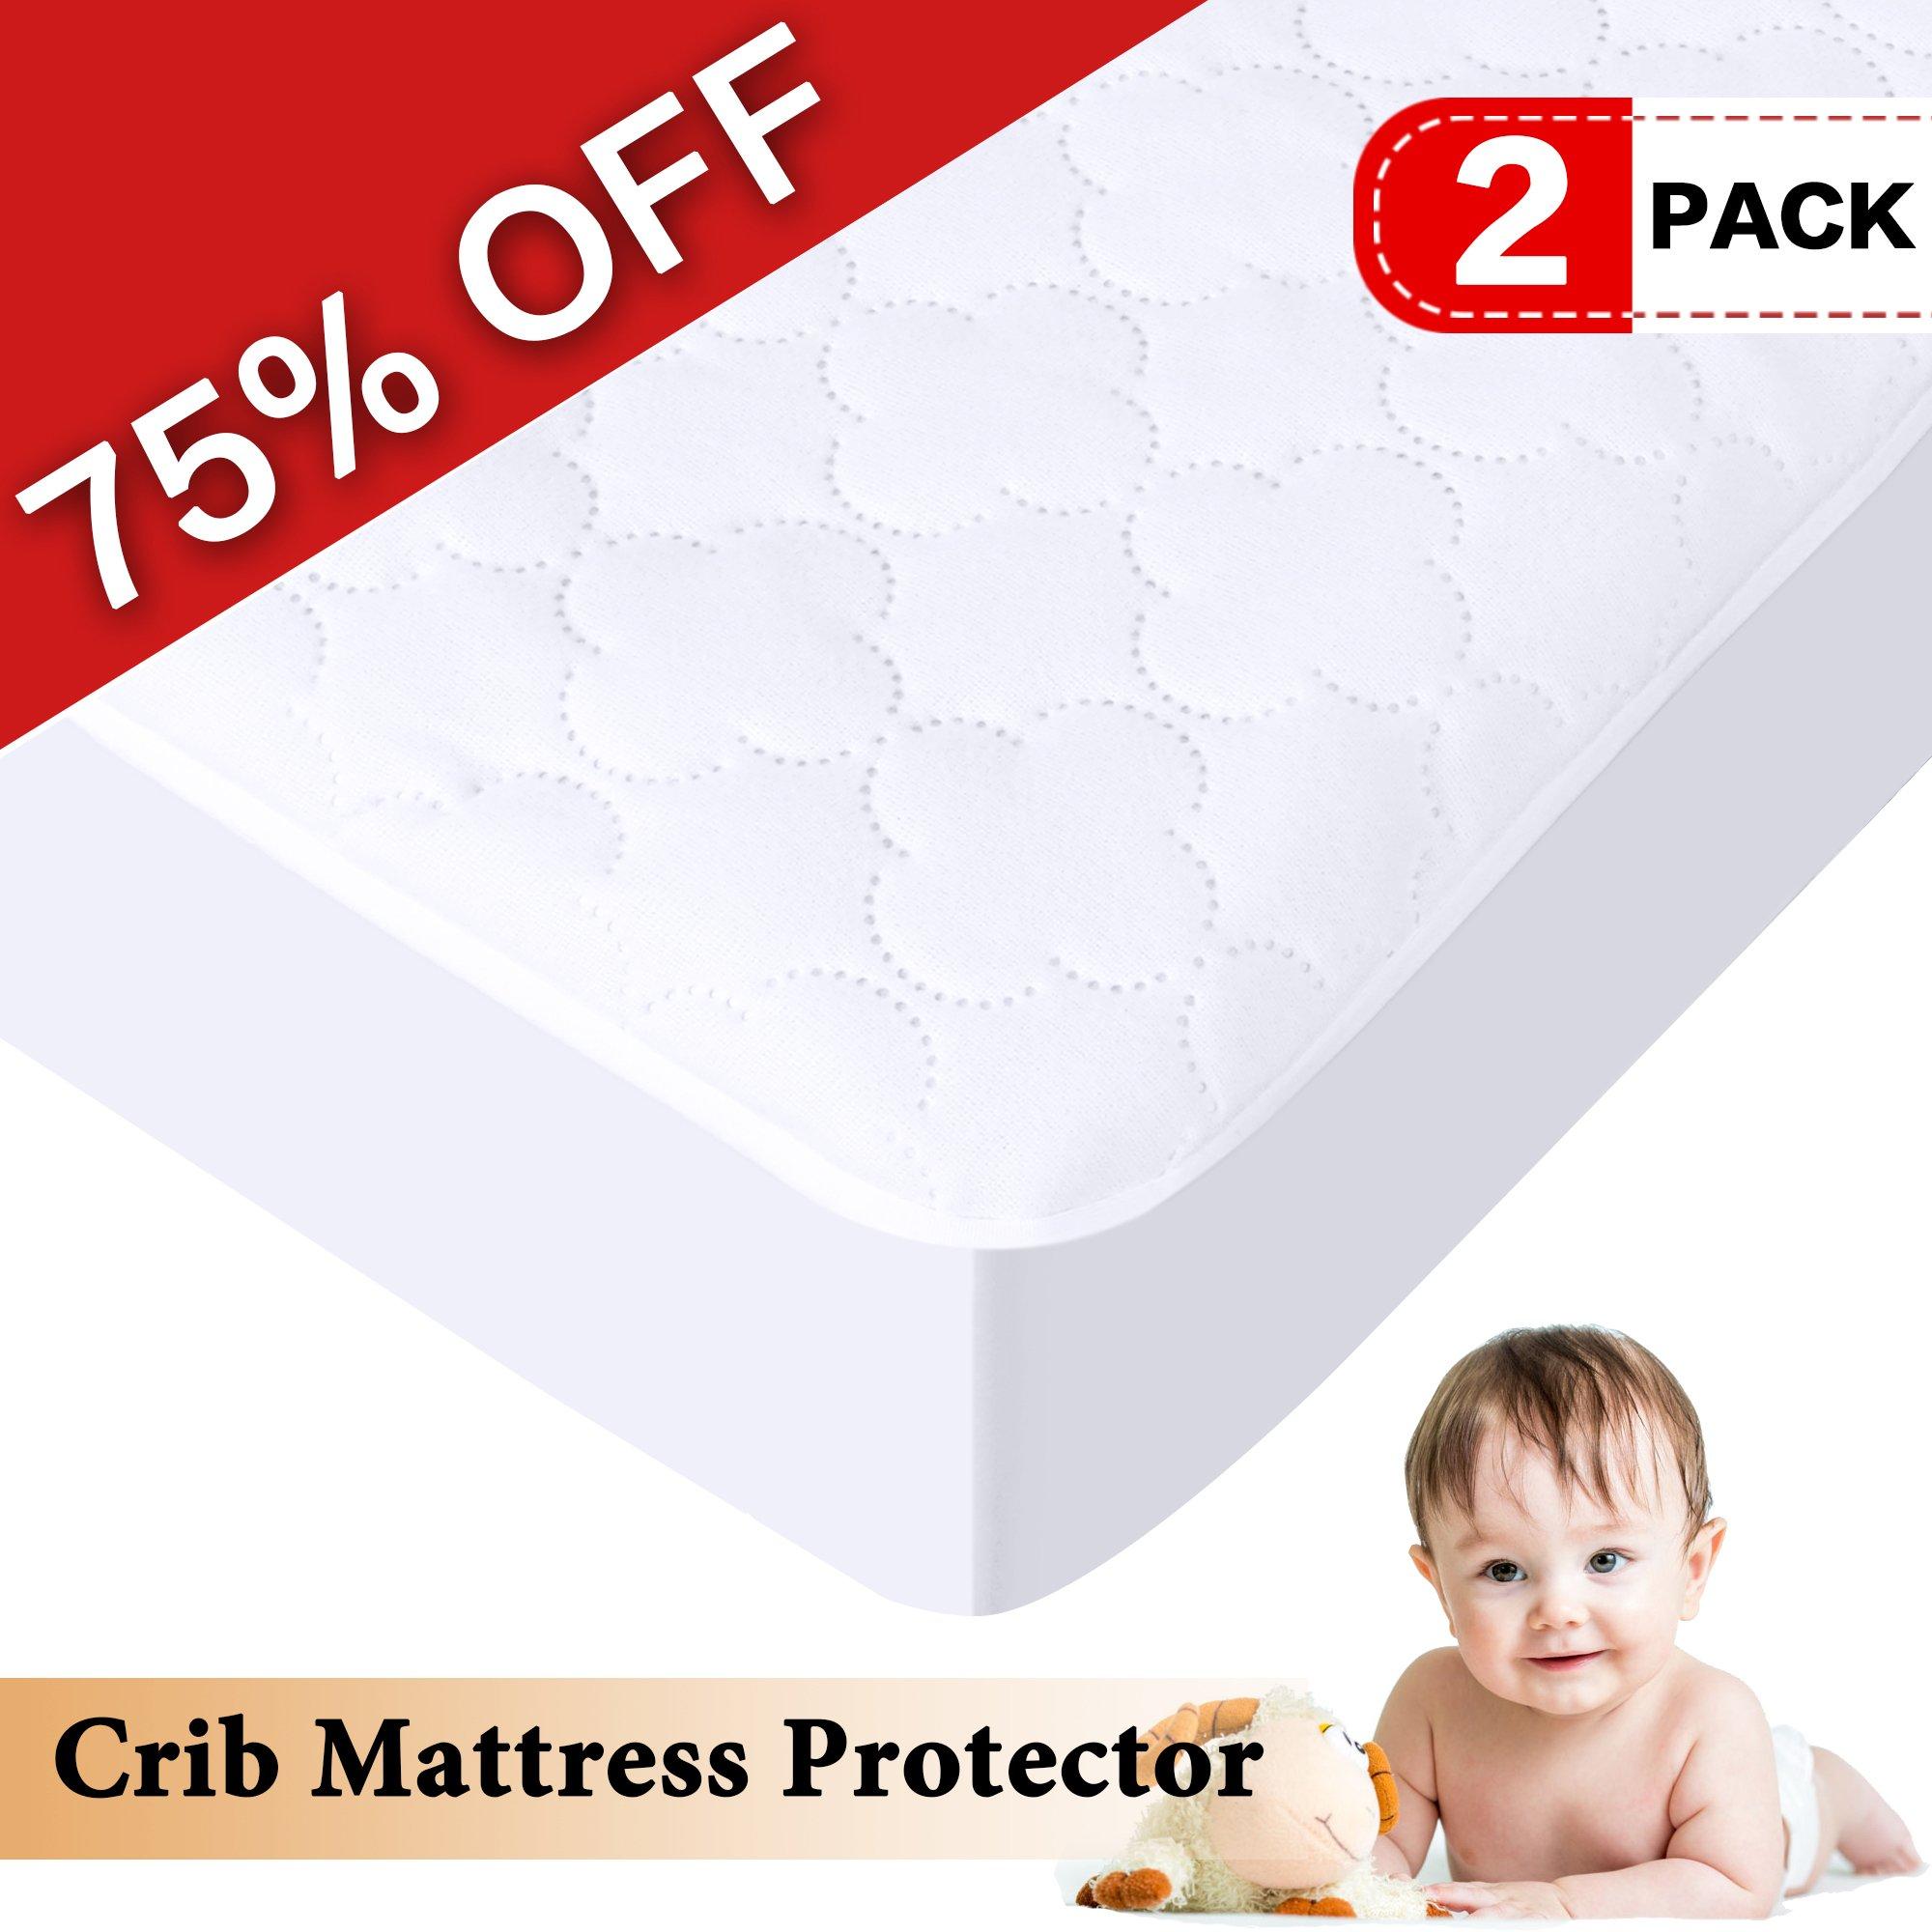 H.VERSAILTEX 100% Waterproof Crib Size Premium Mattress Protector Hypoallergenic, Vinyl Free, Breathable Soft Cotton Terry Surface (52'' x 28'', 2 packs)